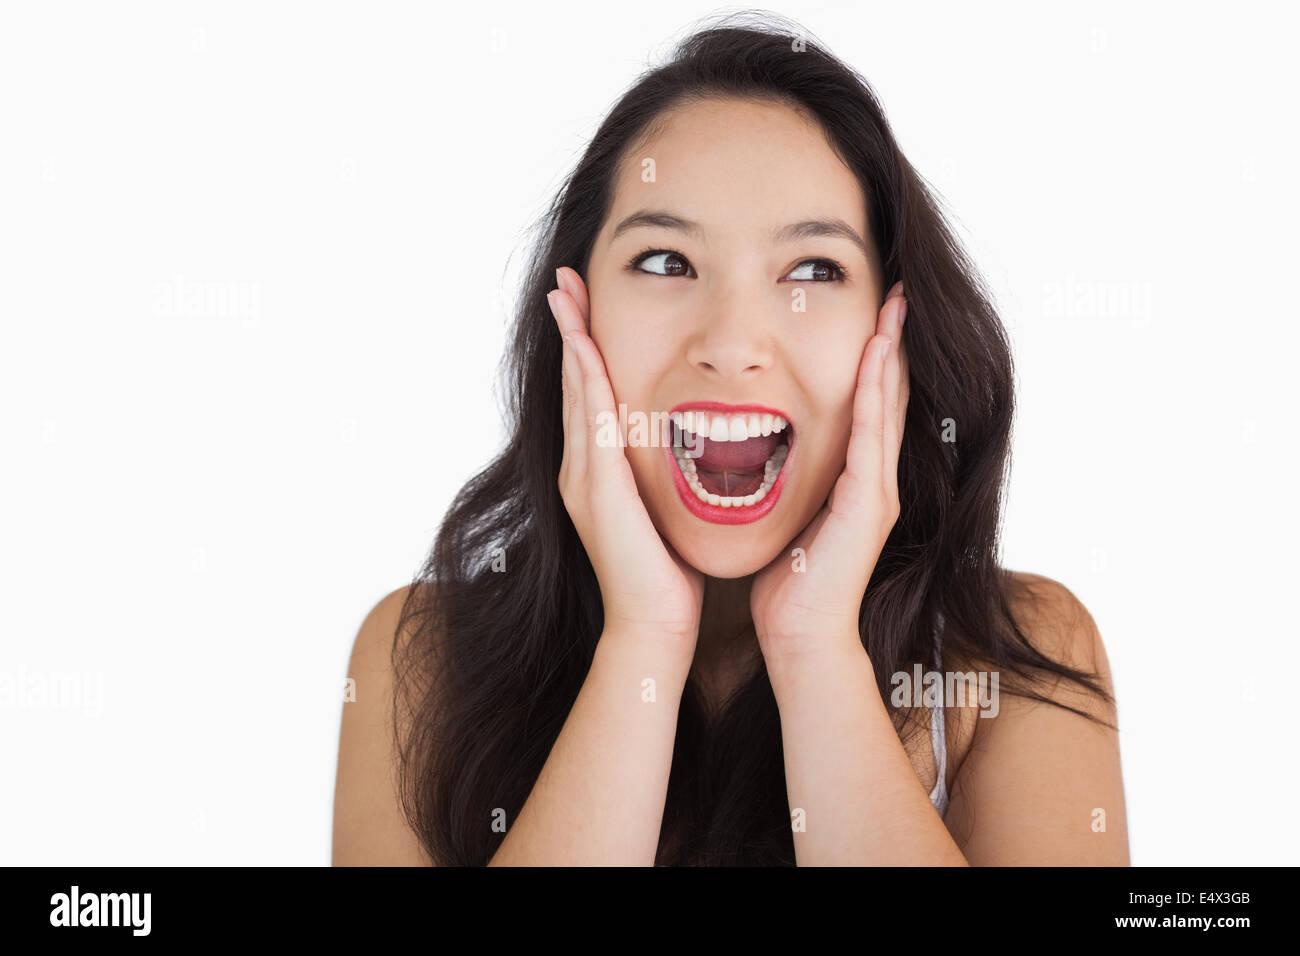 Smiling woman yelling - Stock Image